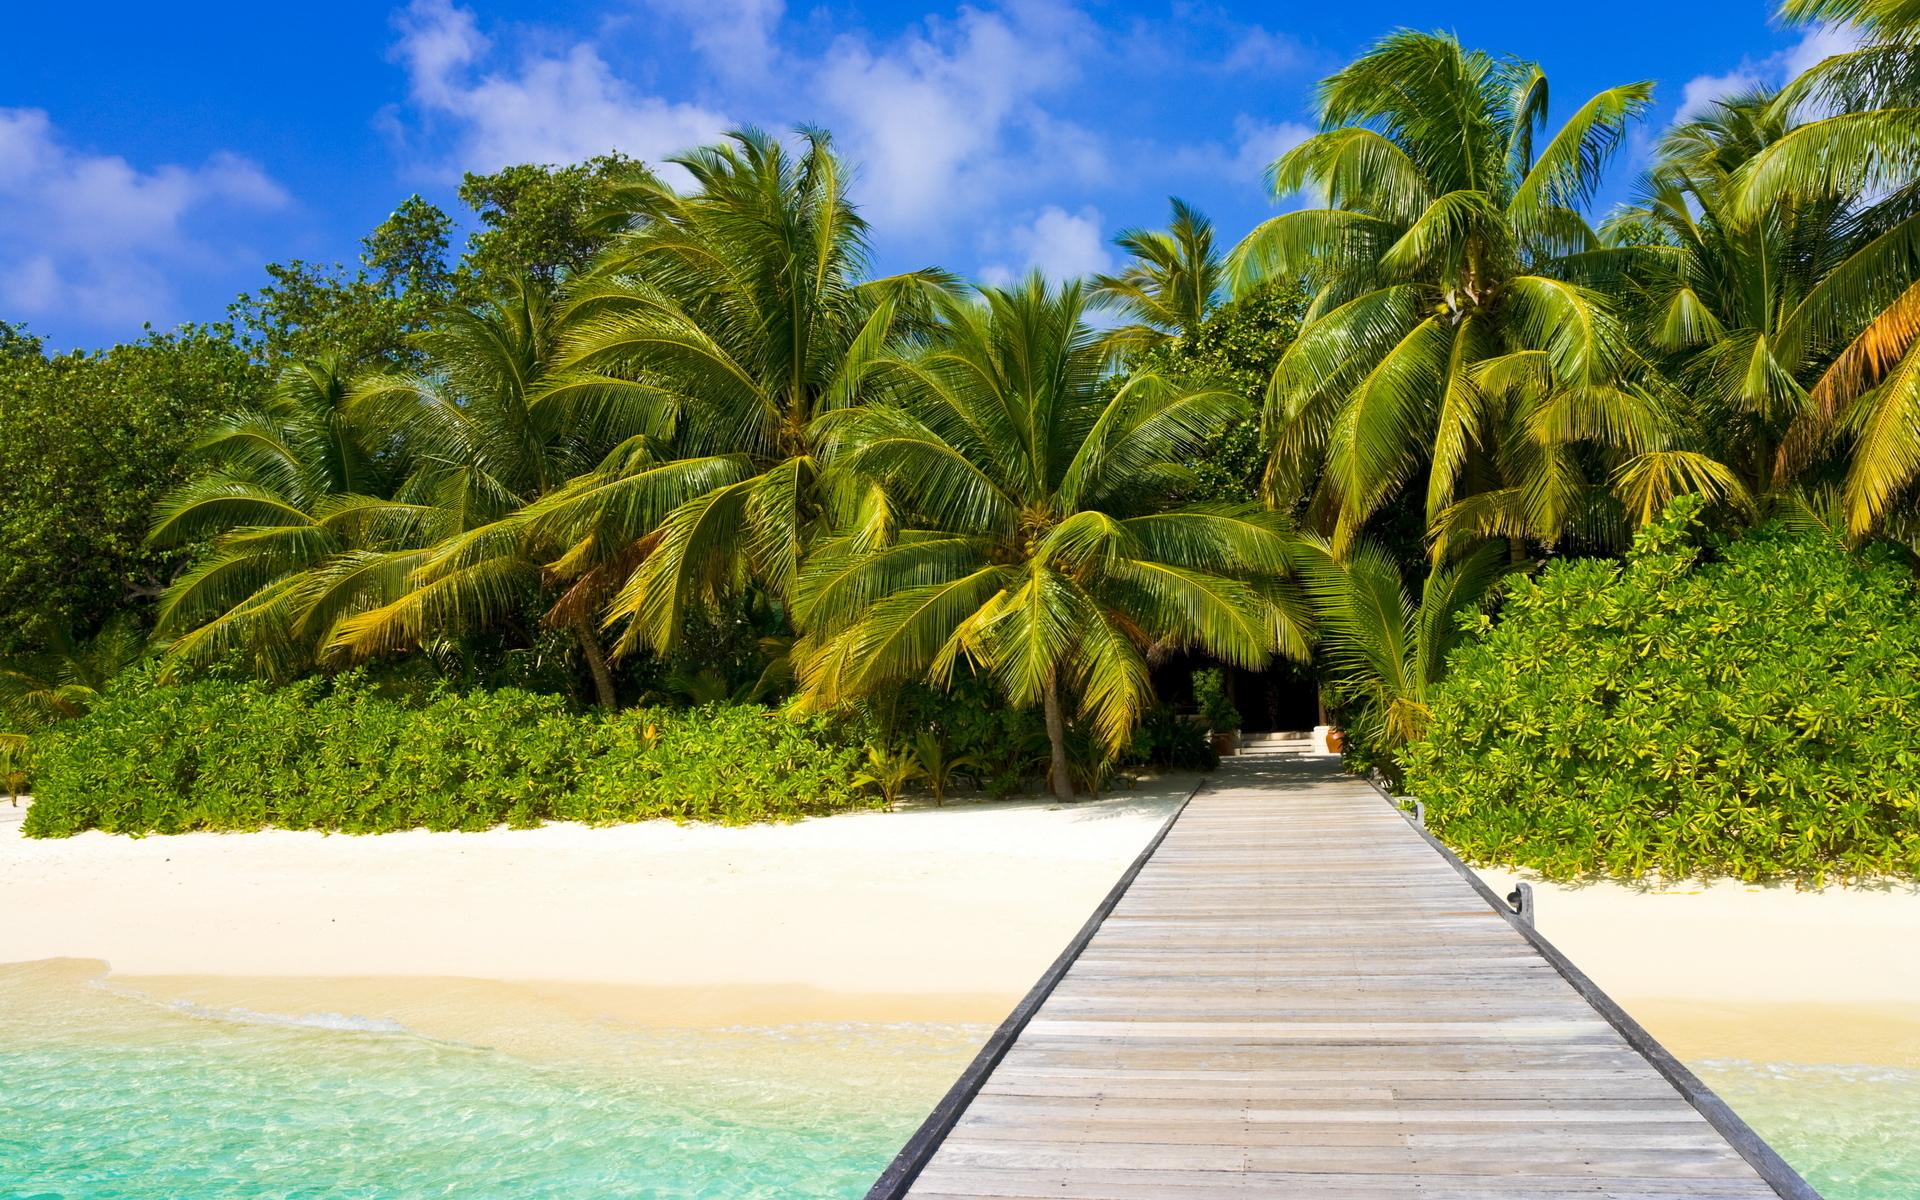 Nature Wallpaper landscape beach beach sand palm trees ocean 1920x1200